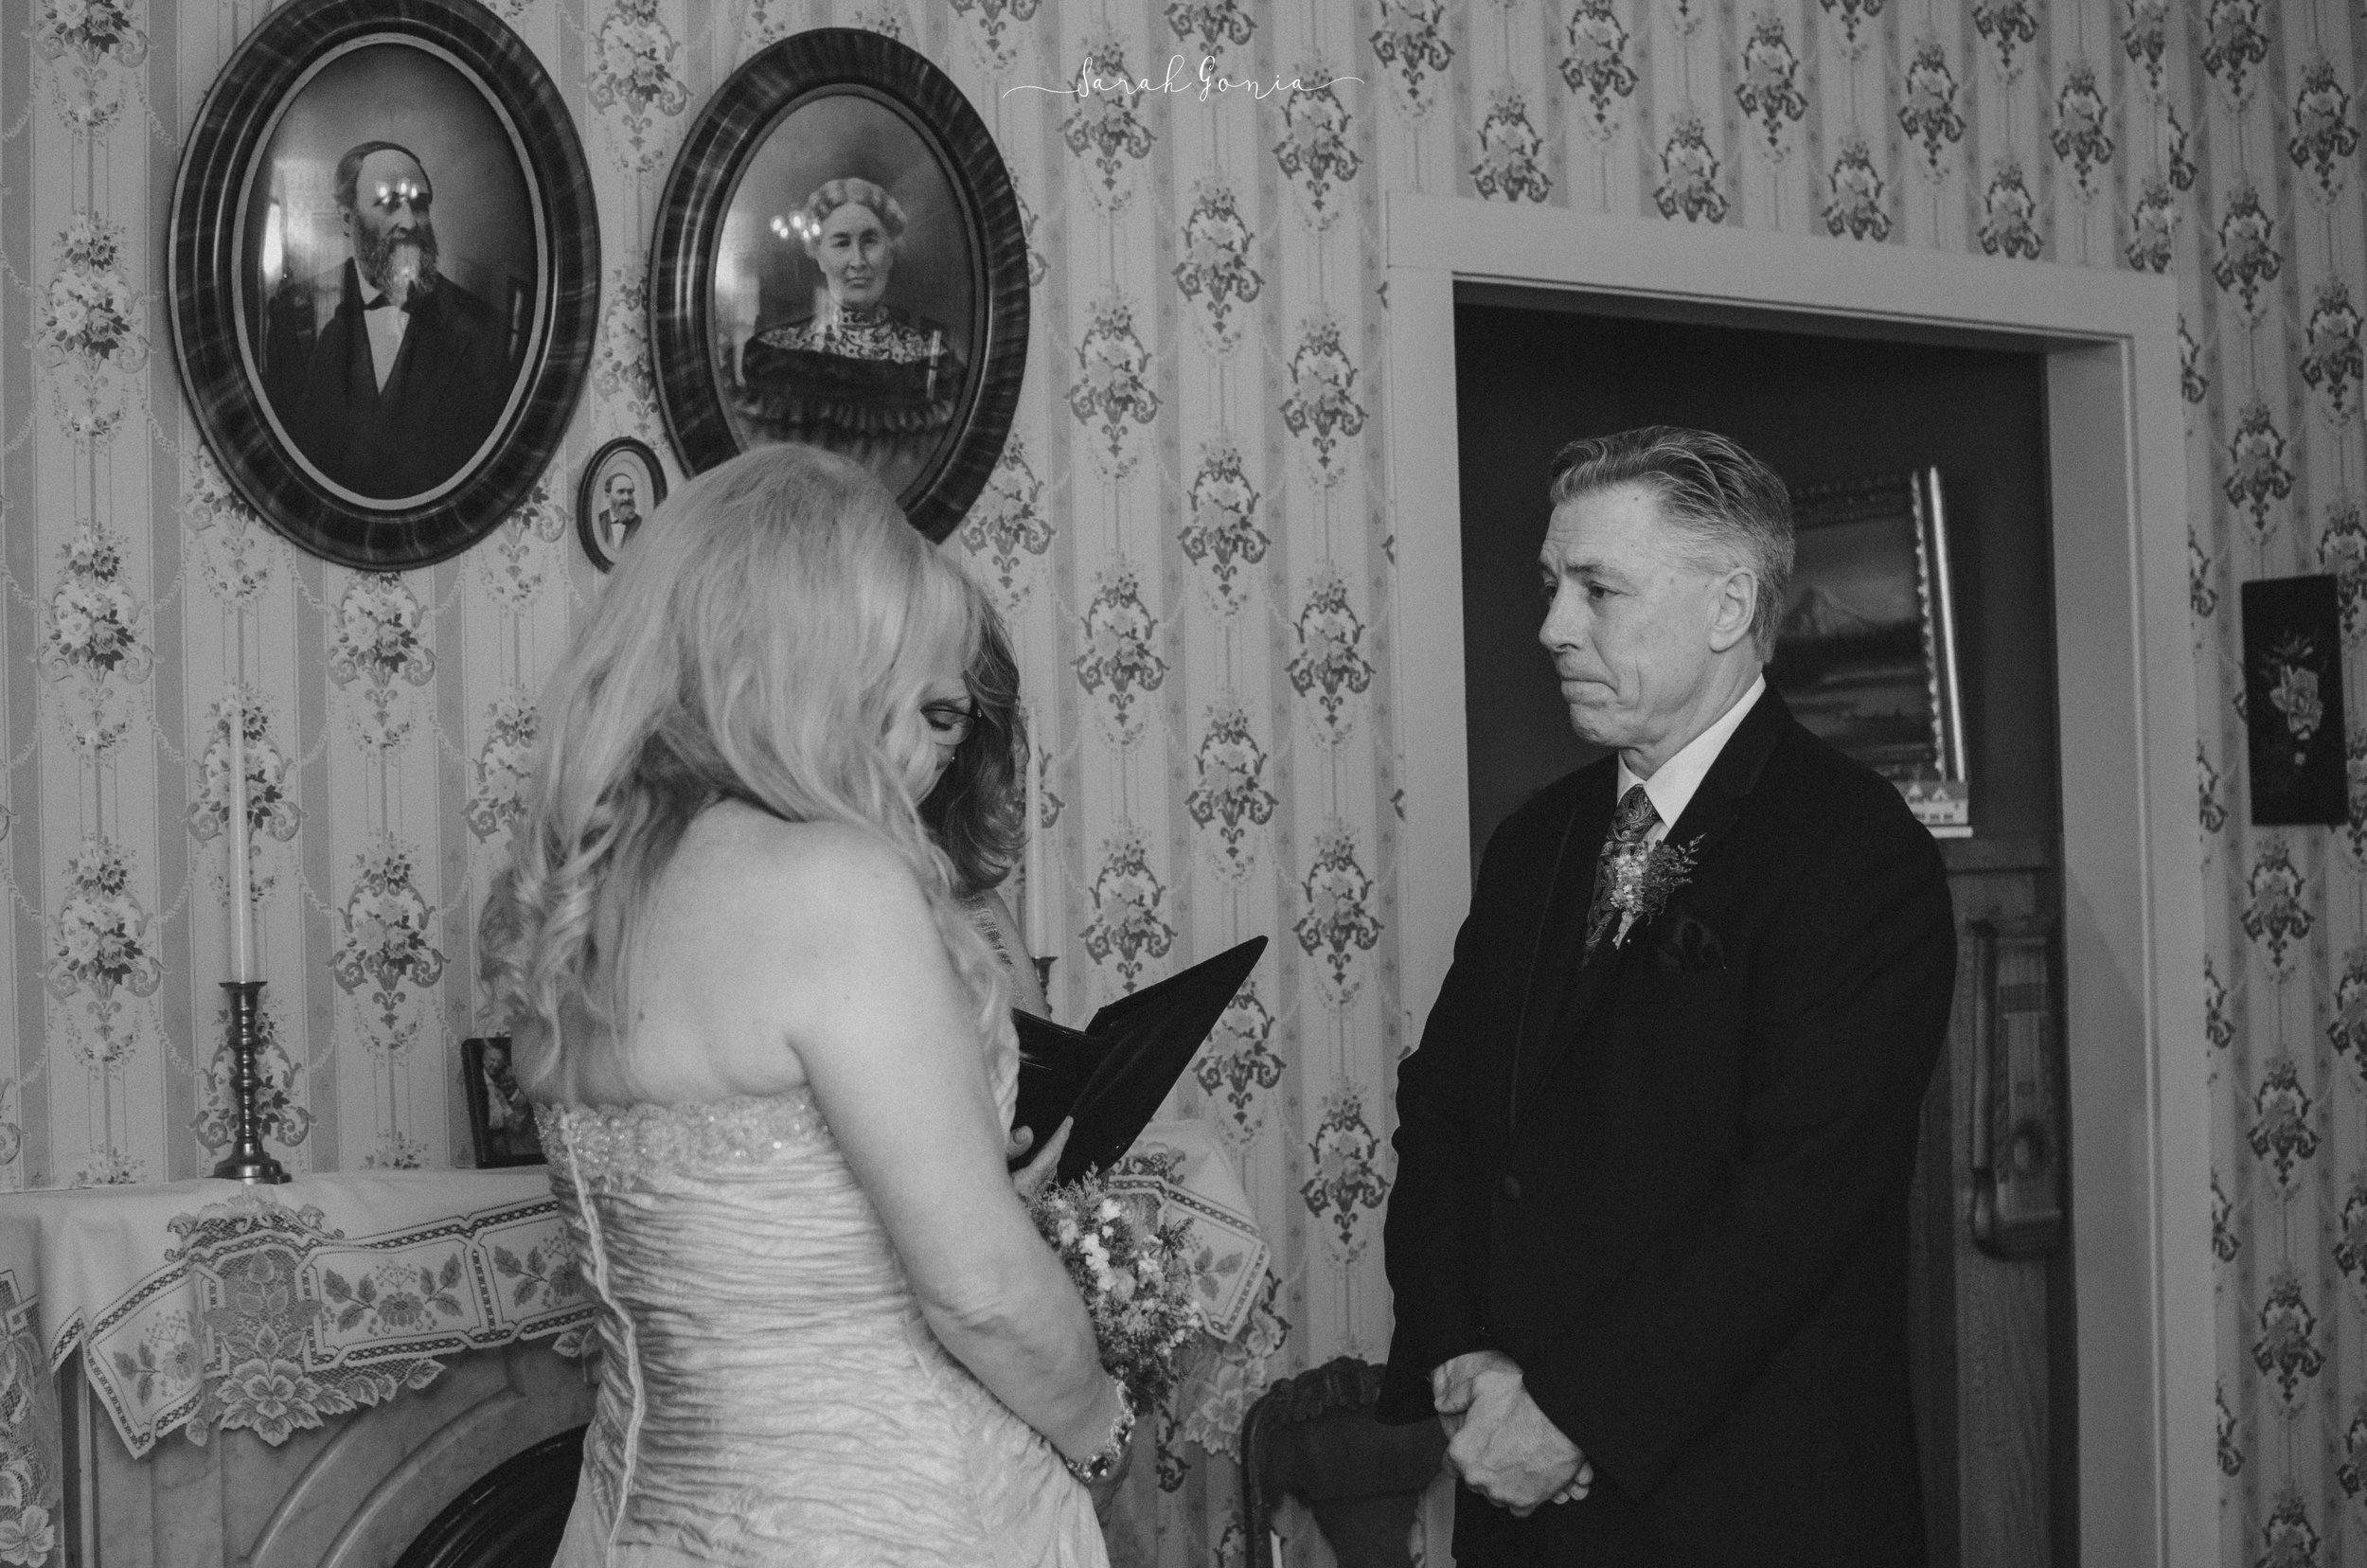 Bigelow House Museum Elopement | Olympia Wedding PhotographerBigelow House Museum Elopement | Olympia Wedding Photographer